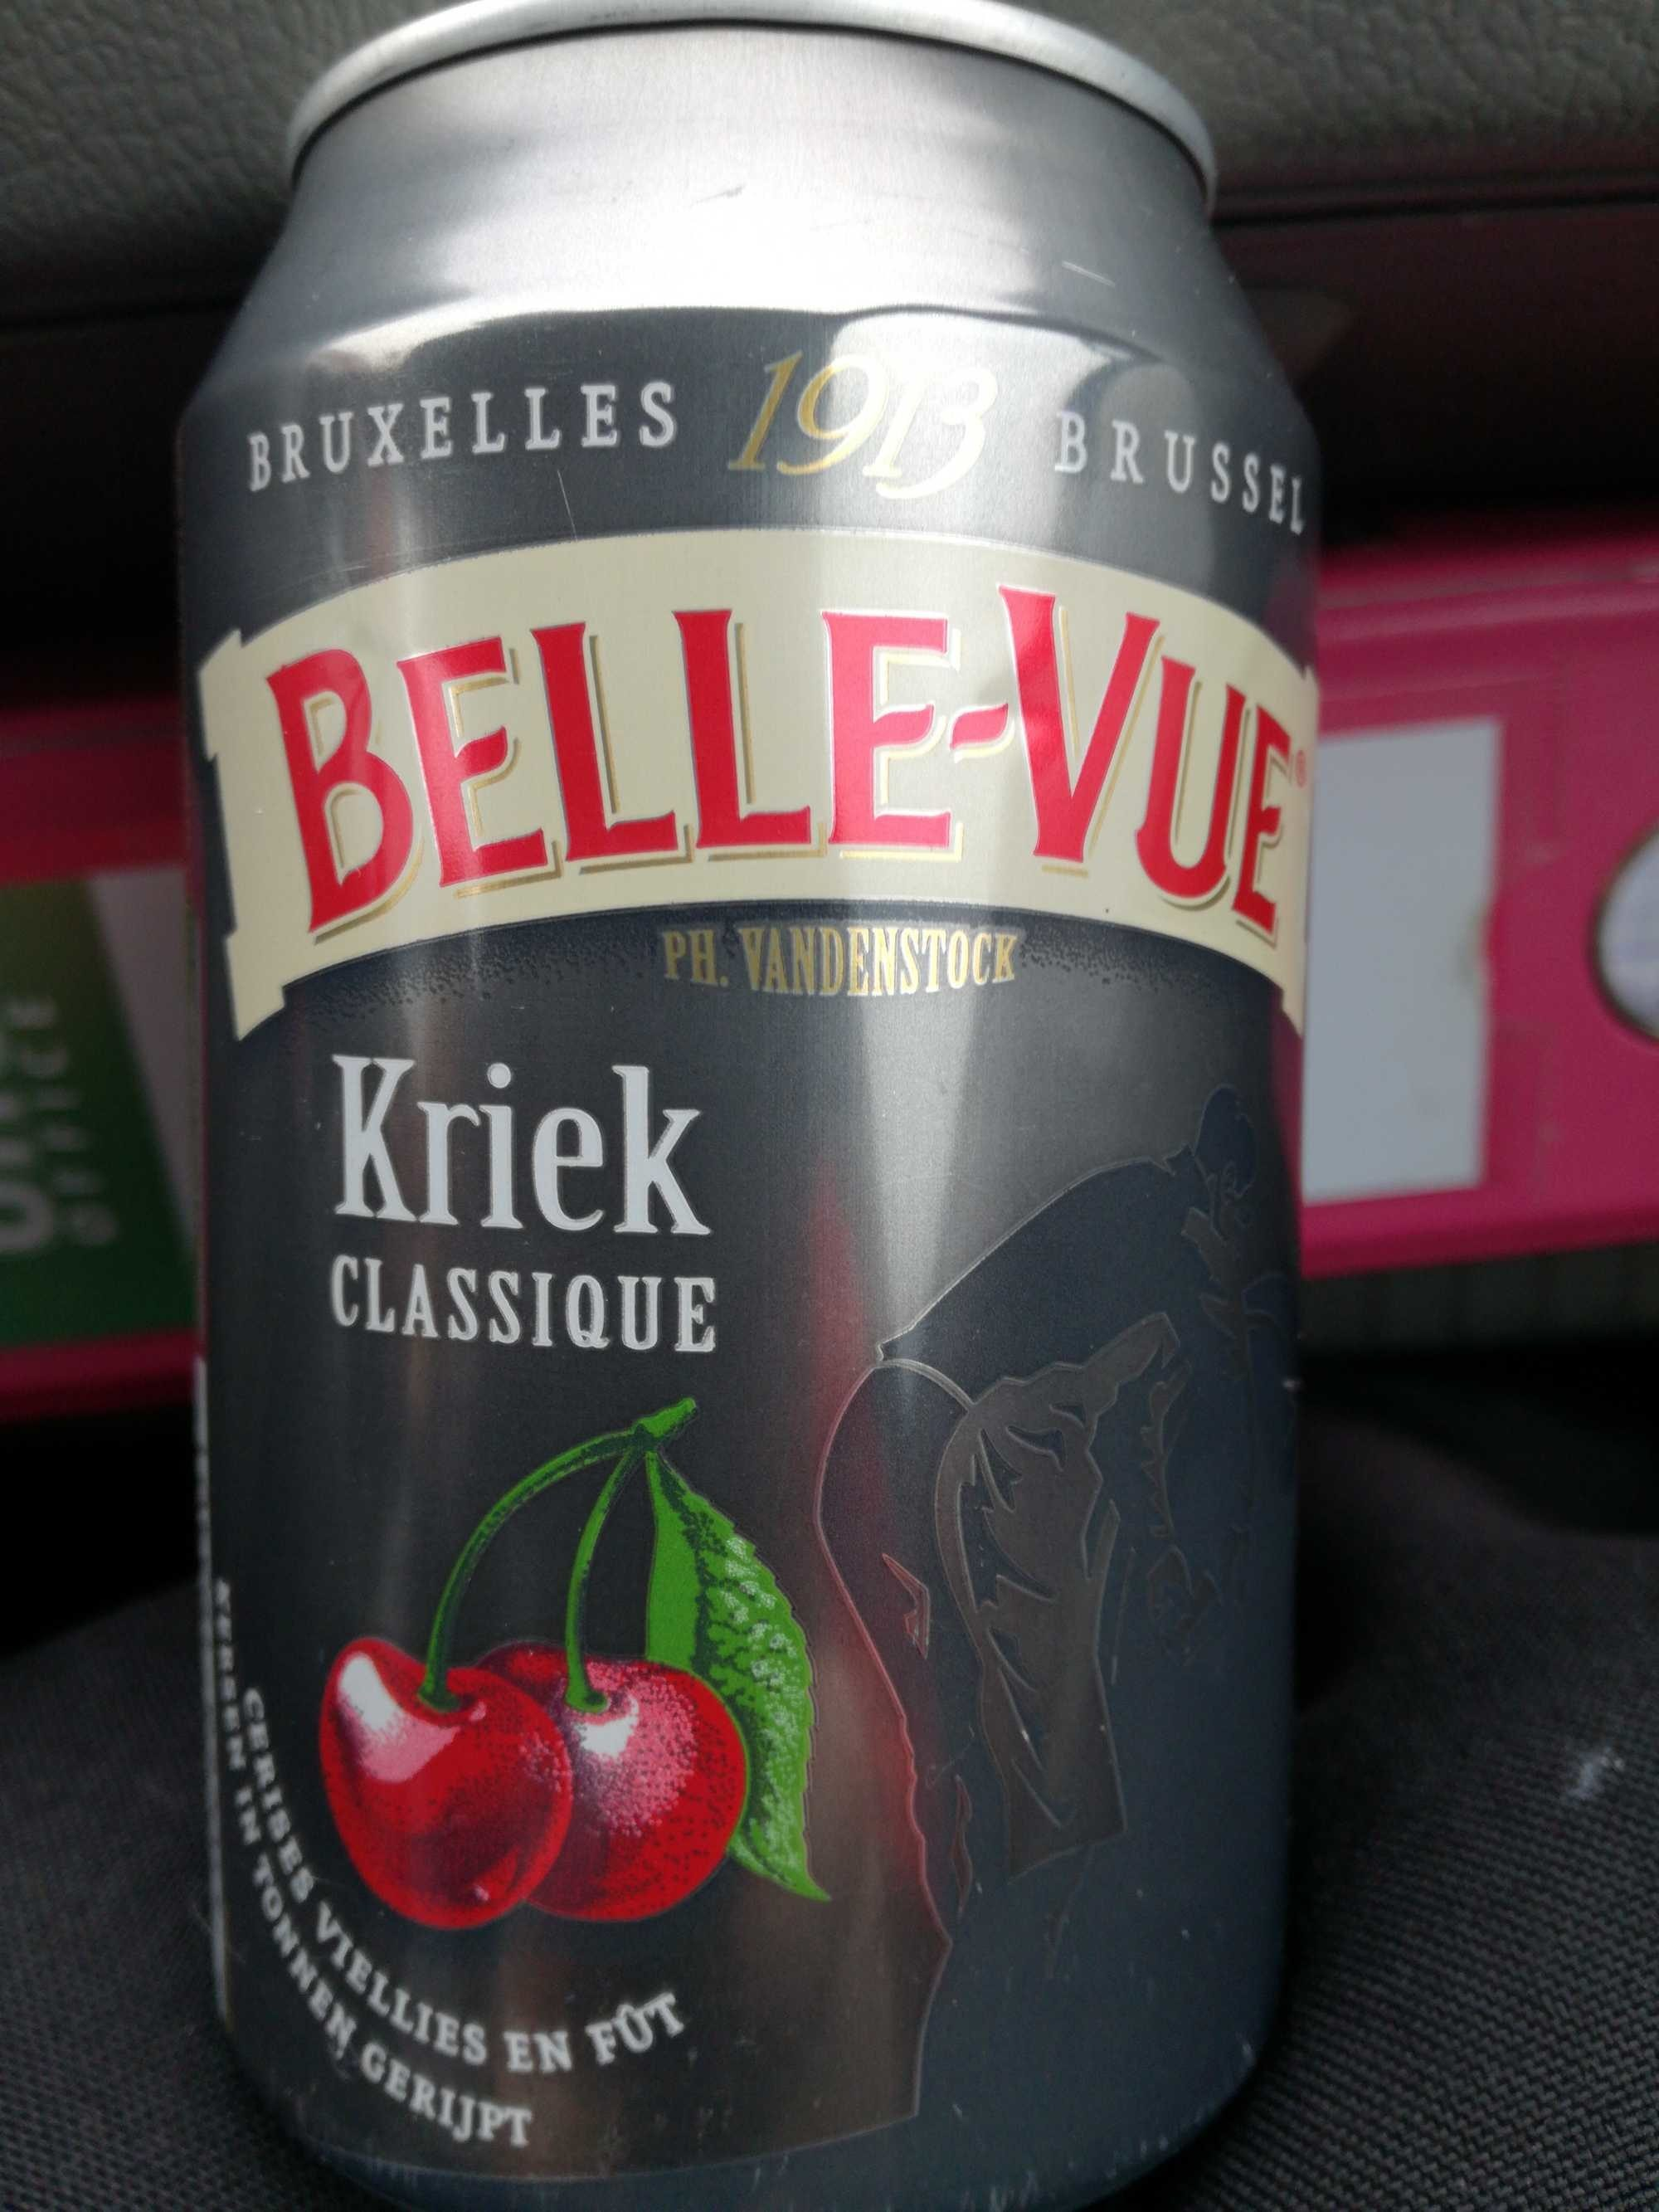 Belle-vue Beer With Cherry Flavor - Classique - Product - fr